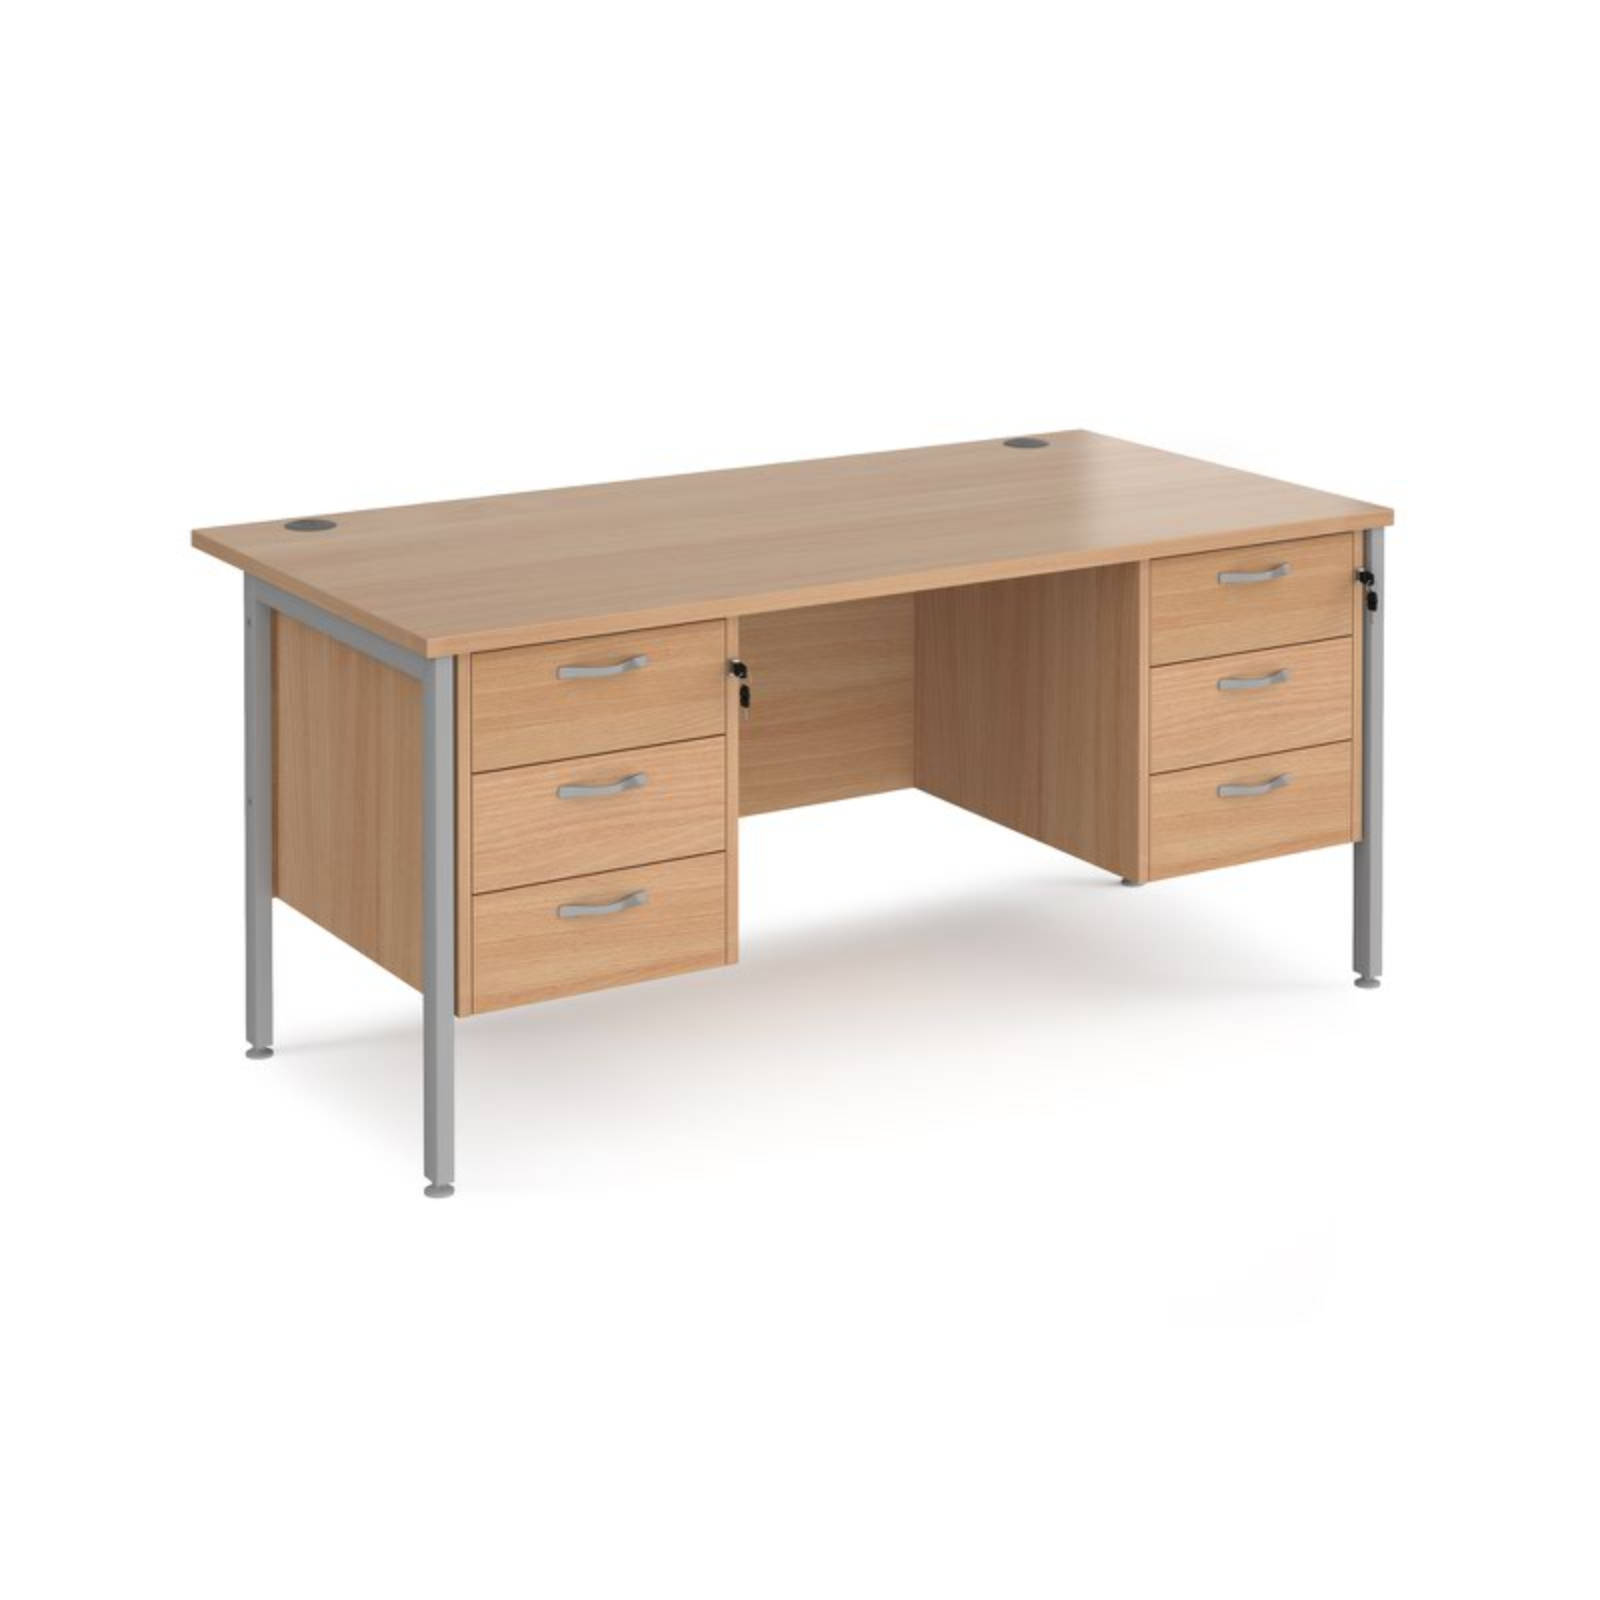 Maestro 25 SL Straight Desk With 3 And Drawer Pedestals 1600mm